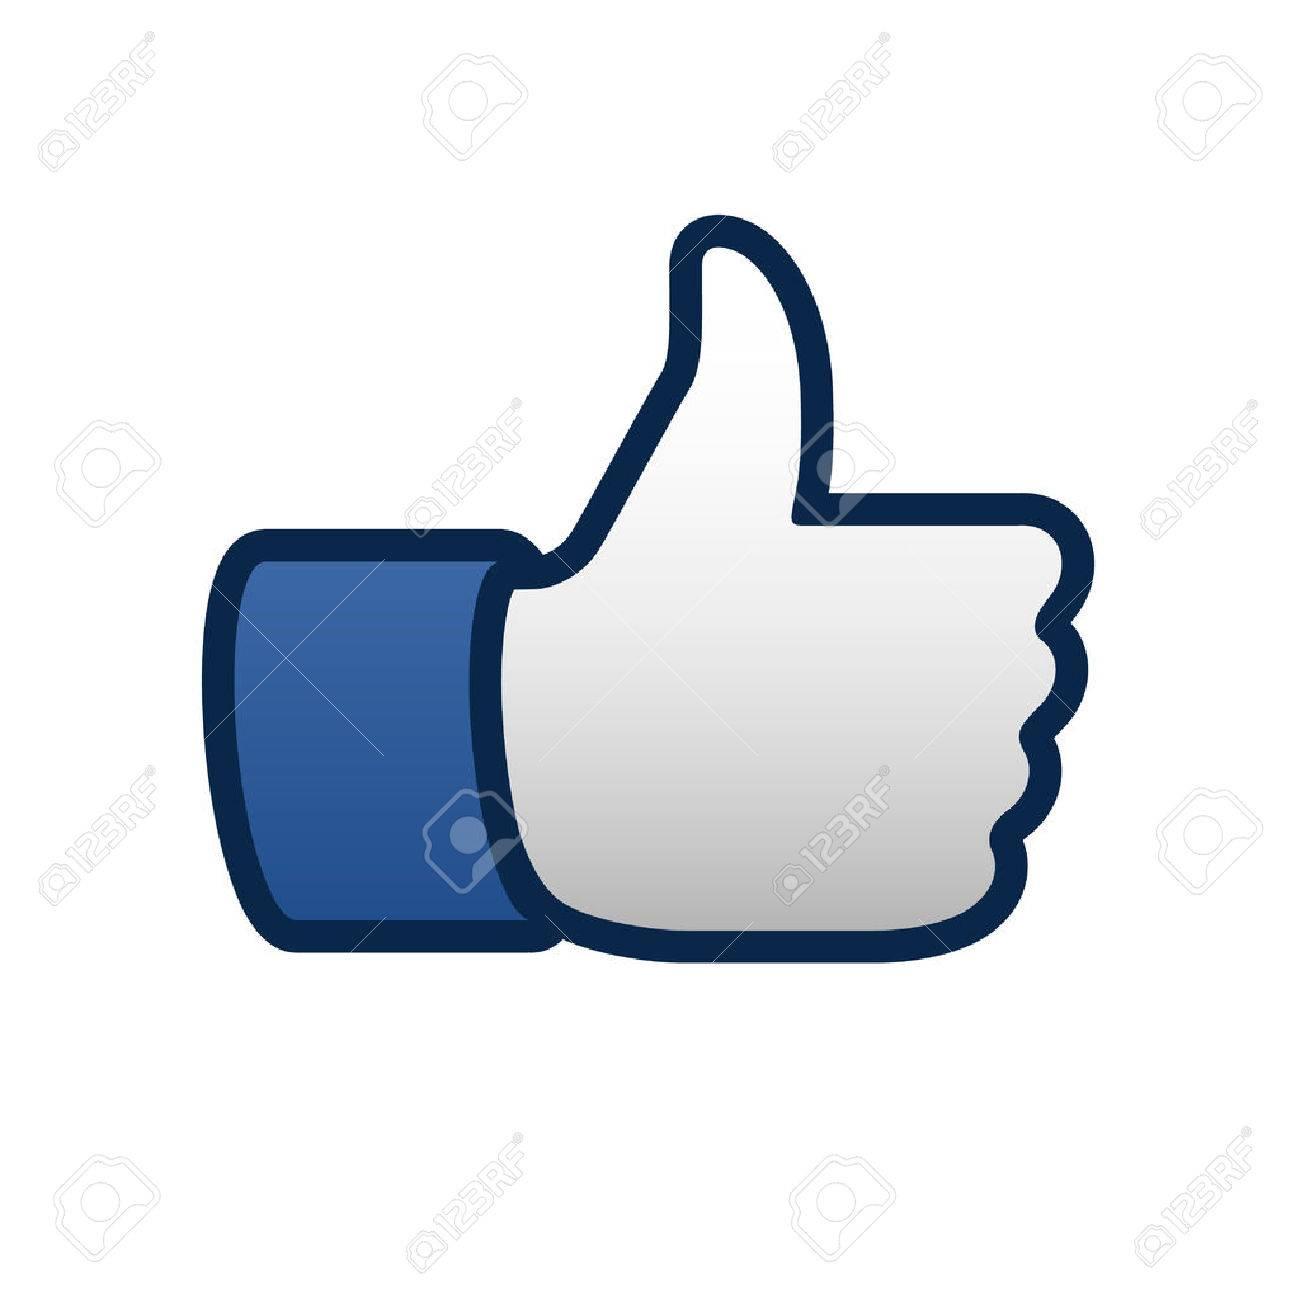 Best like thumbs up symbol icon, vector illustration. Standard-Bild - 38732239